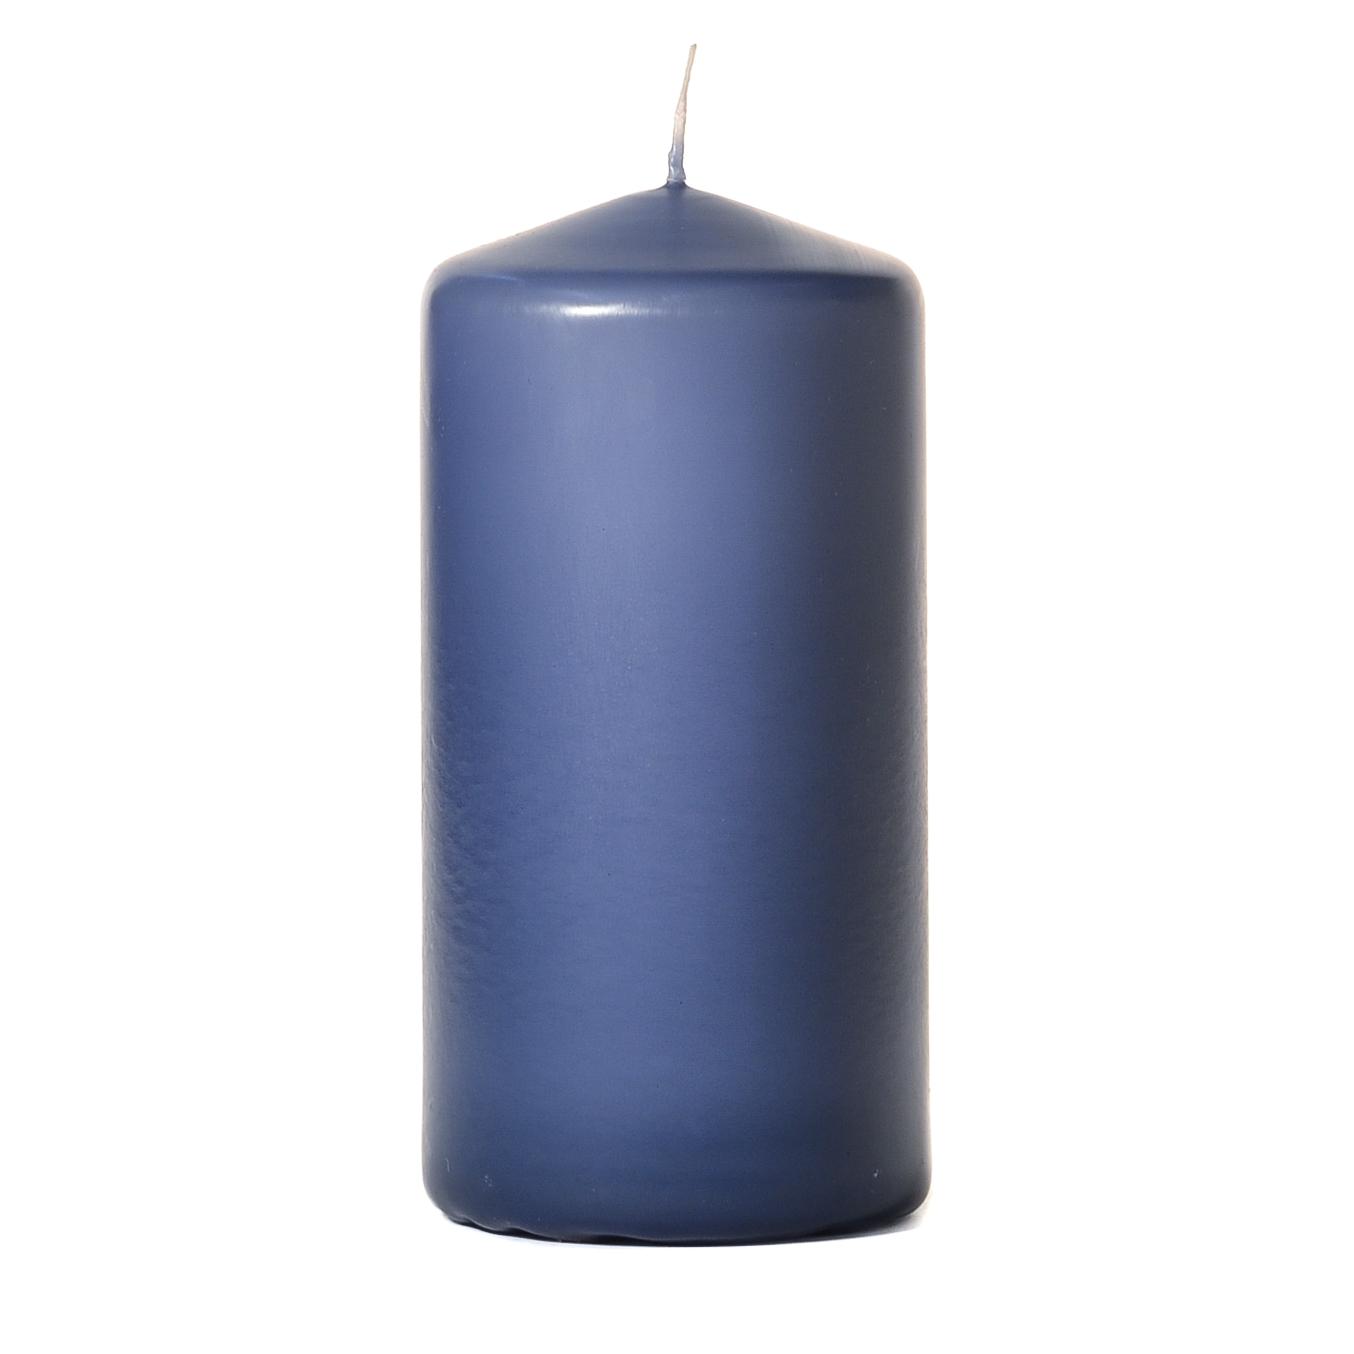 3x6 Wedgwood Pillar Candles Unscented